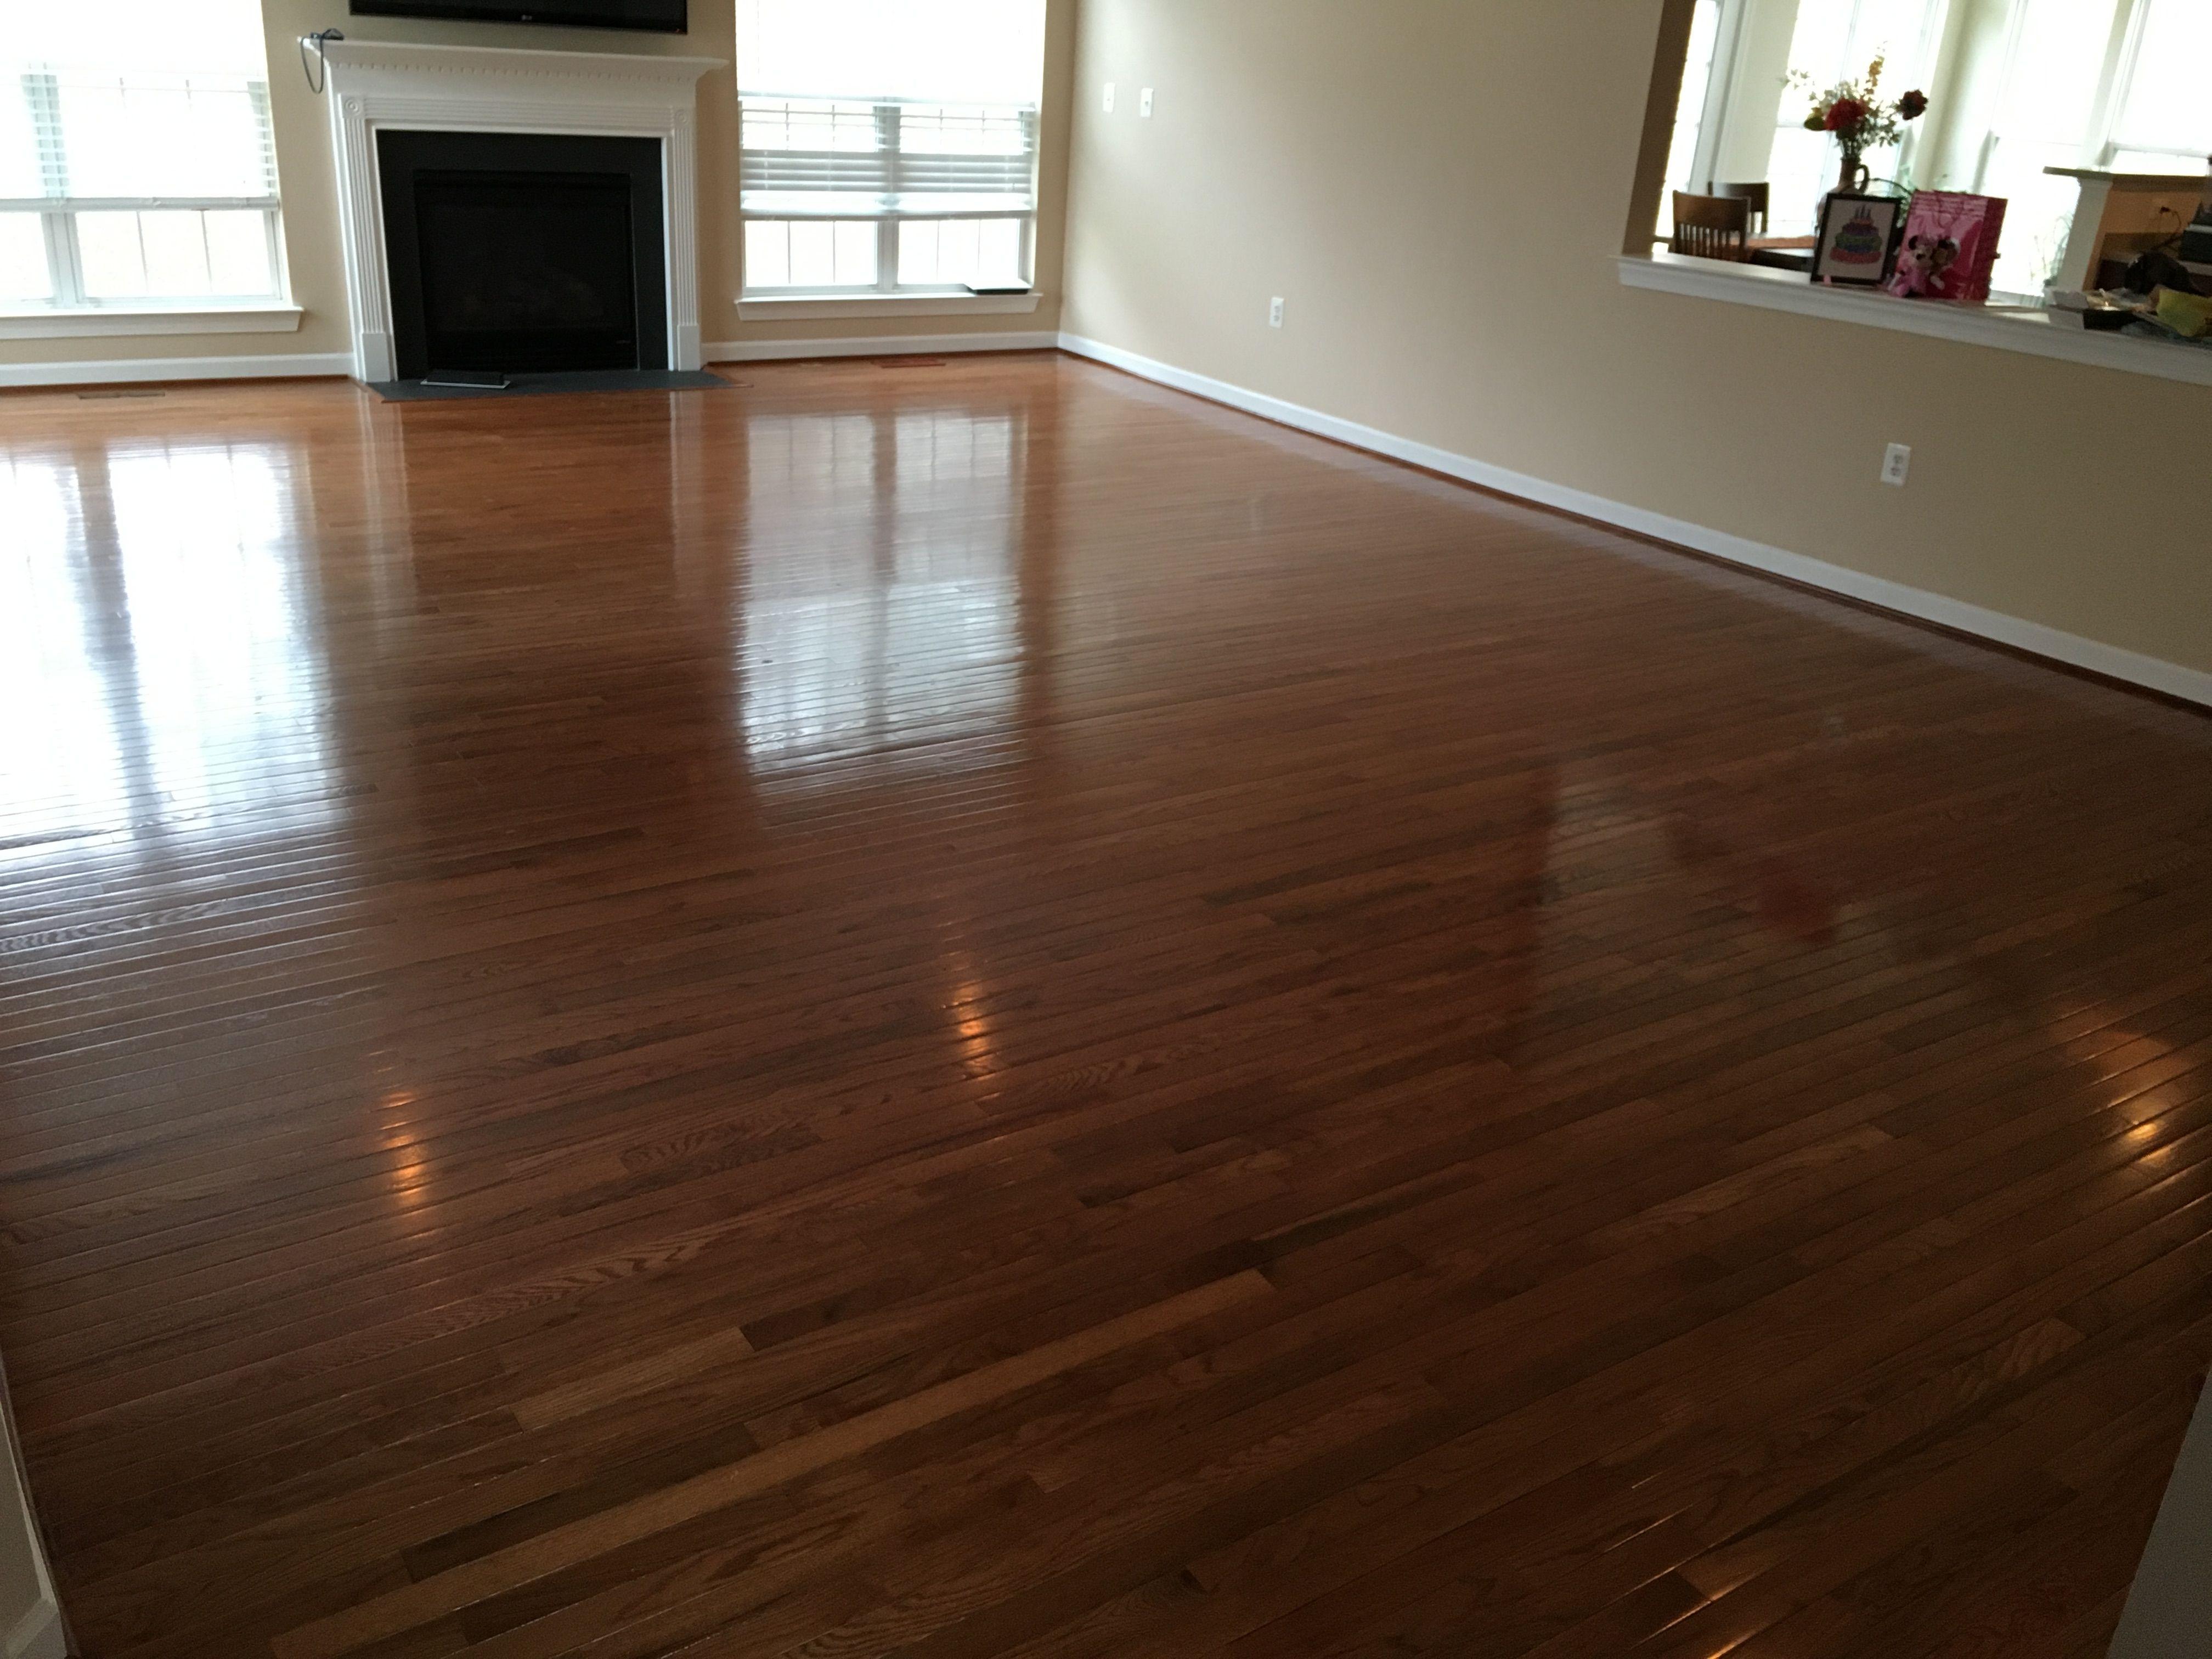 We are no top rated local contractor of hardwood floor